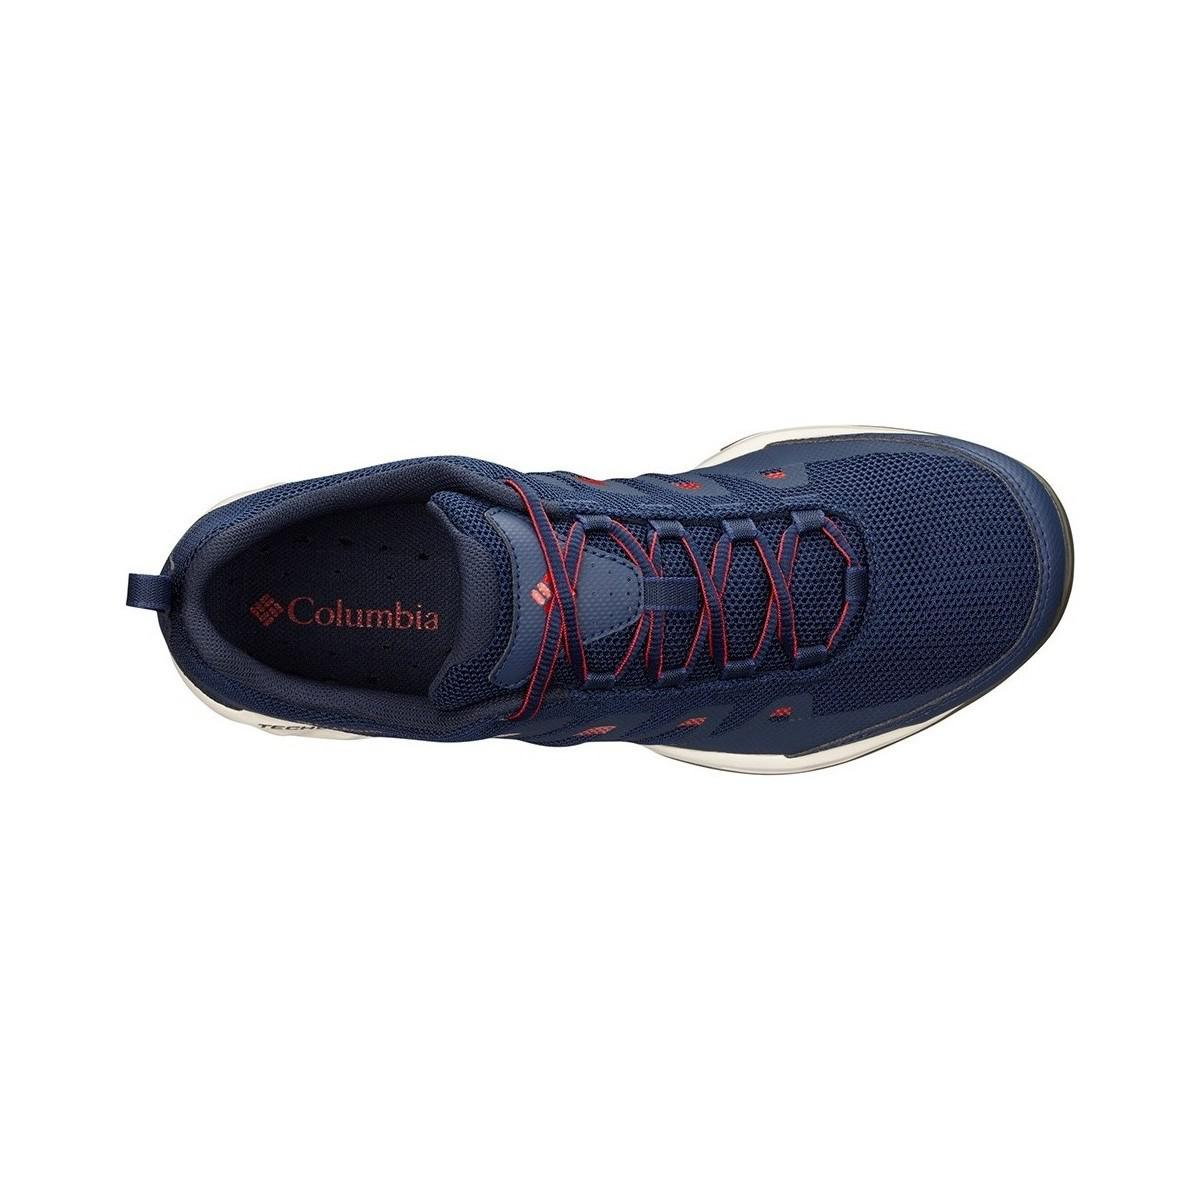 Columbia Vapor Vent Men's Shoes (trainers) In Multicolour in Blue for Men